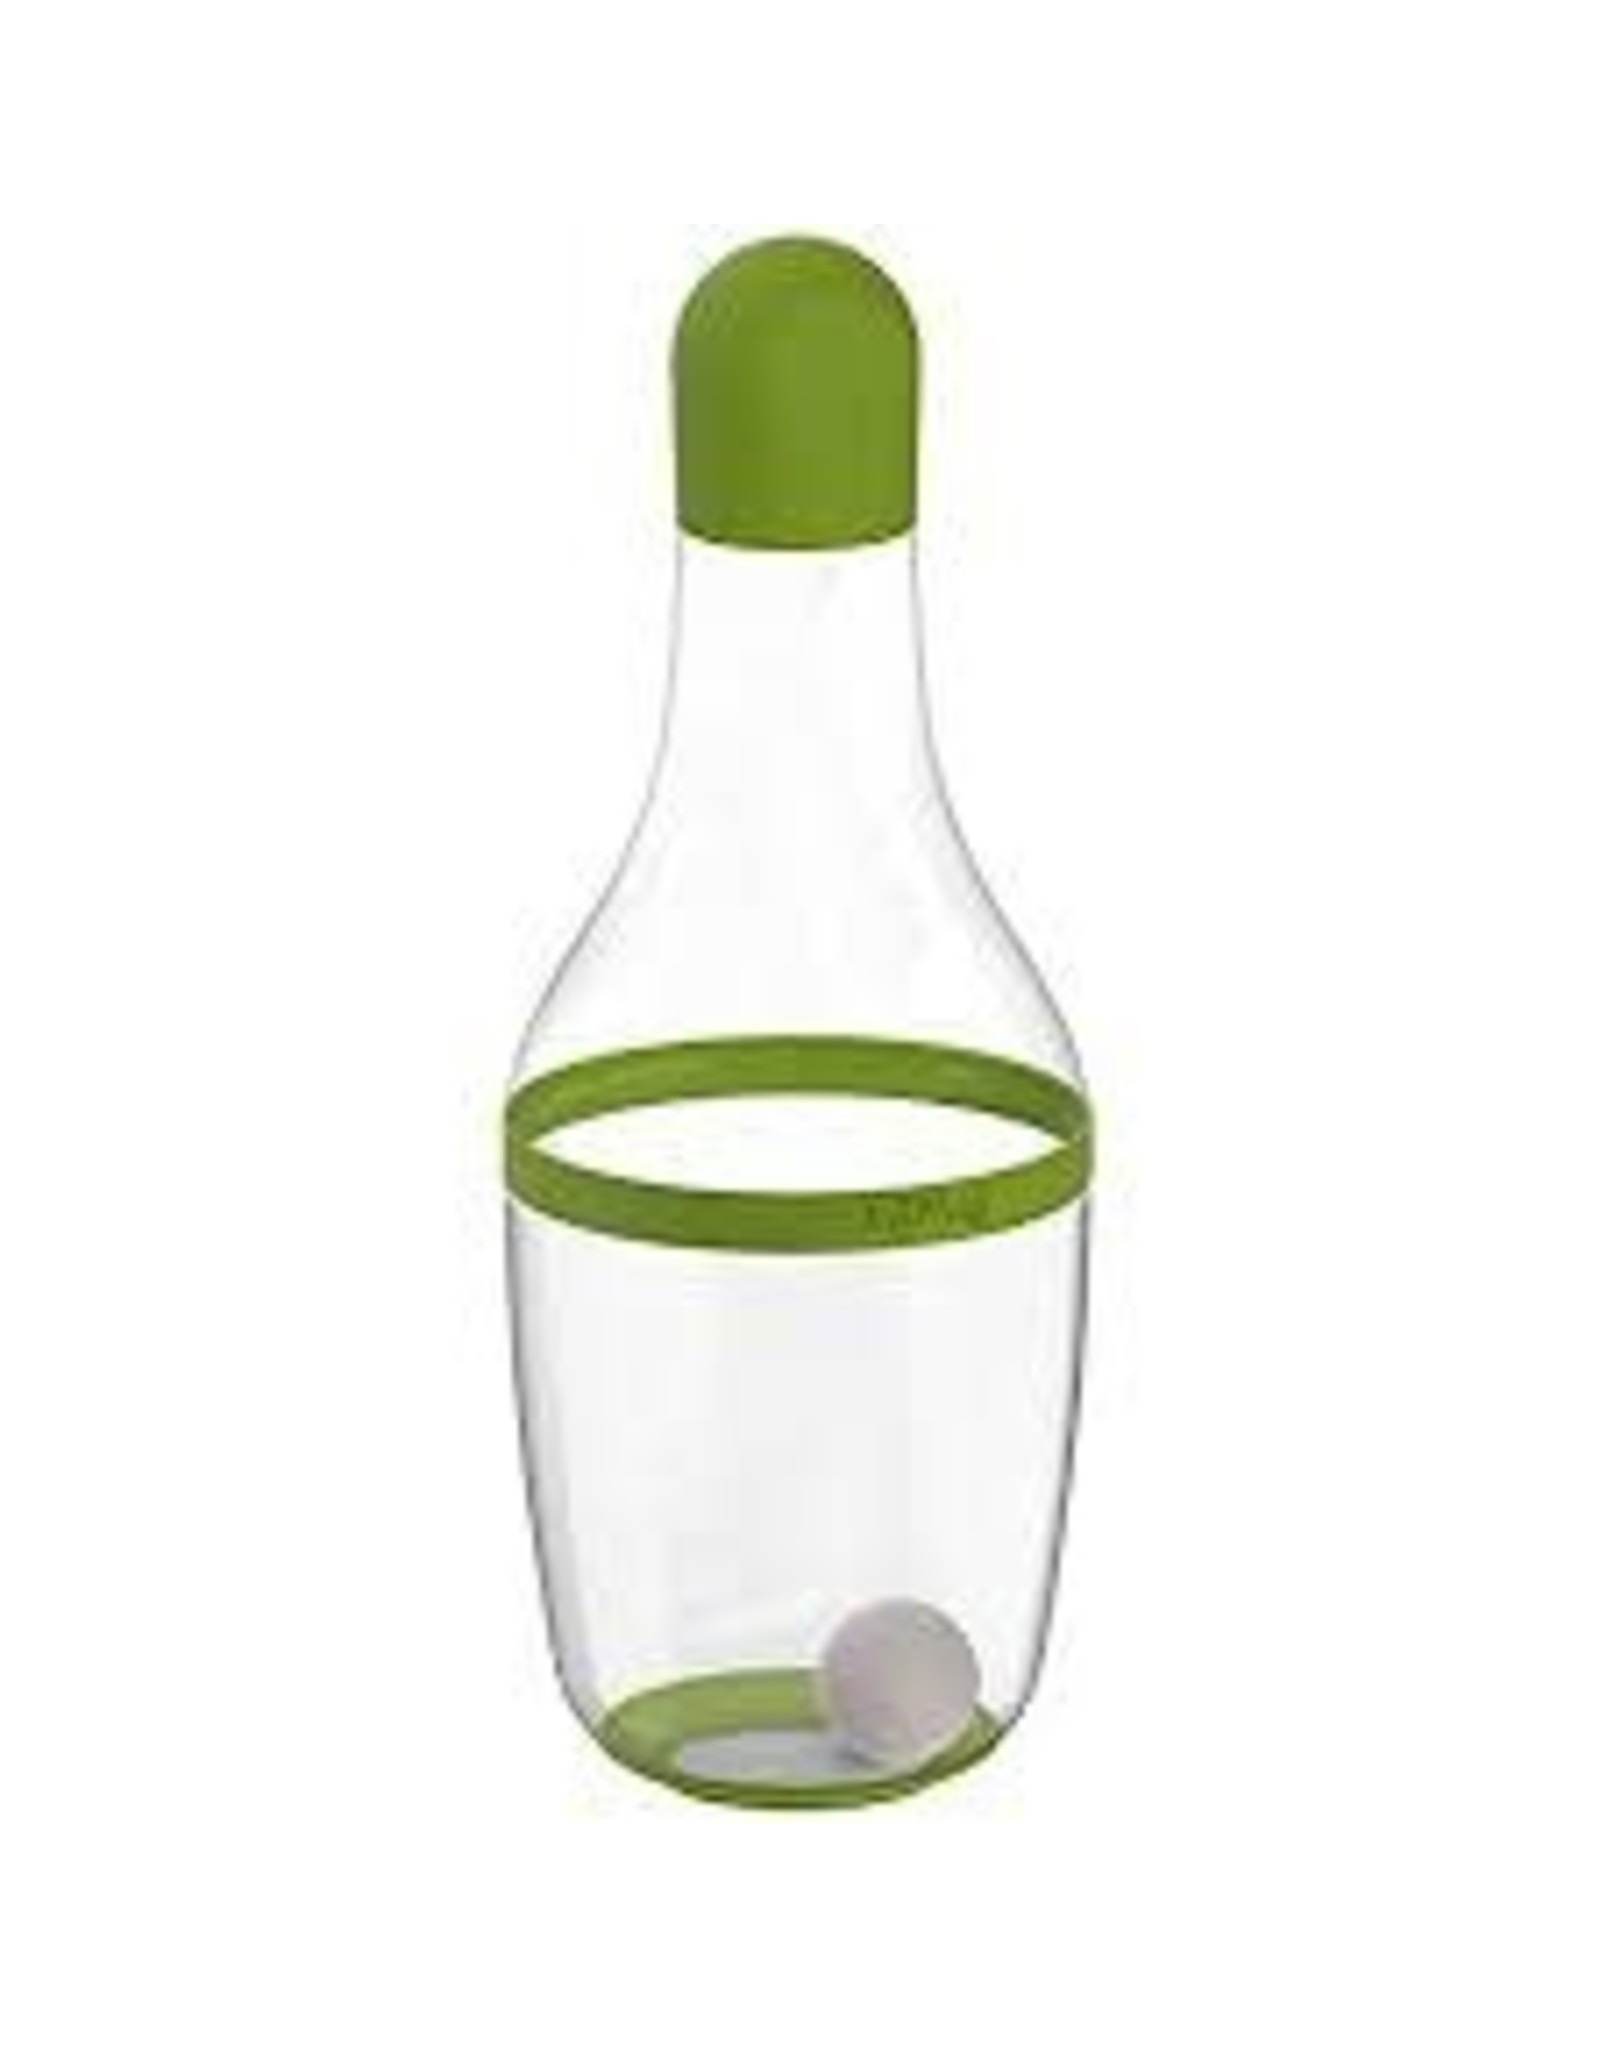 Lekue LEKUE Salad Dressing Green Shaker